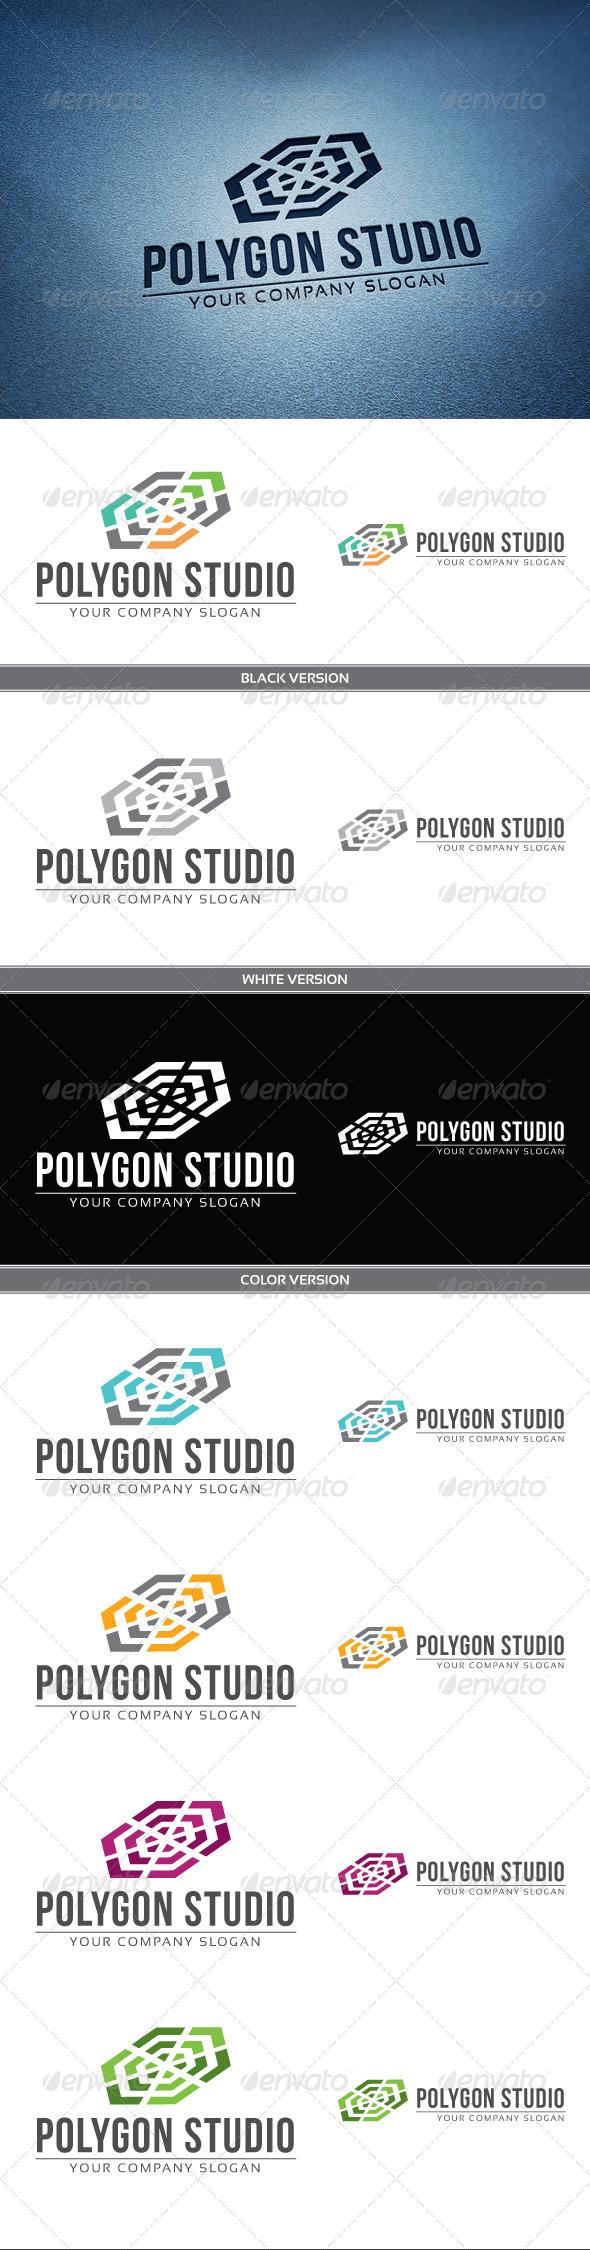 GraphicRiver Polygon Studio Logo 3995480